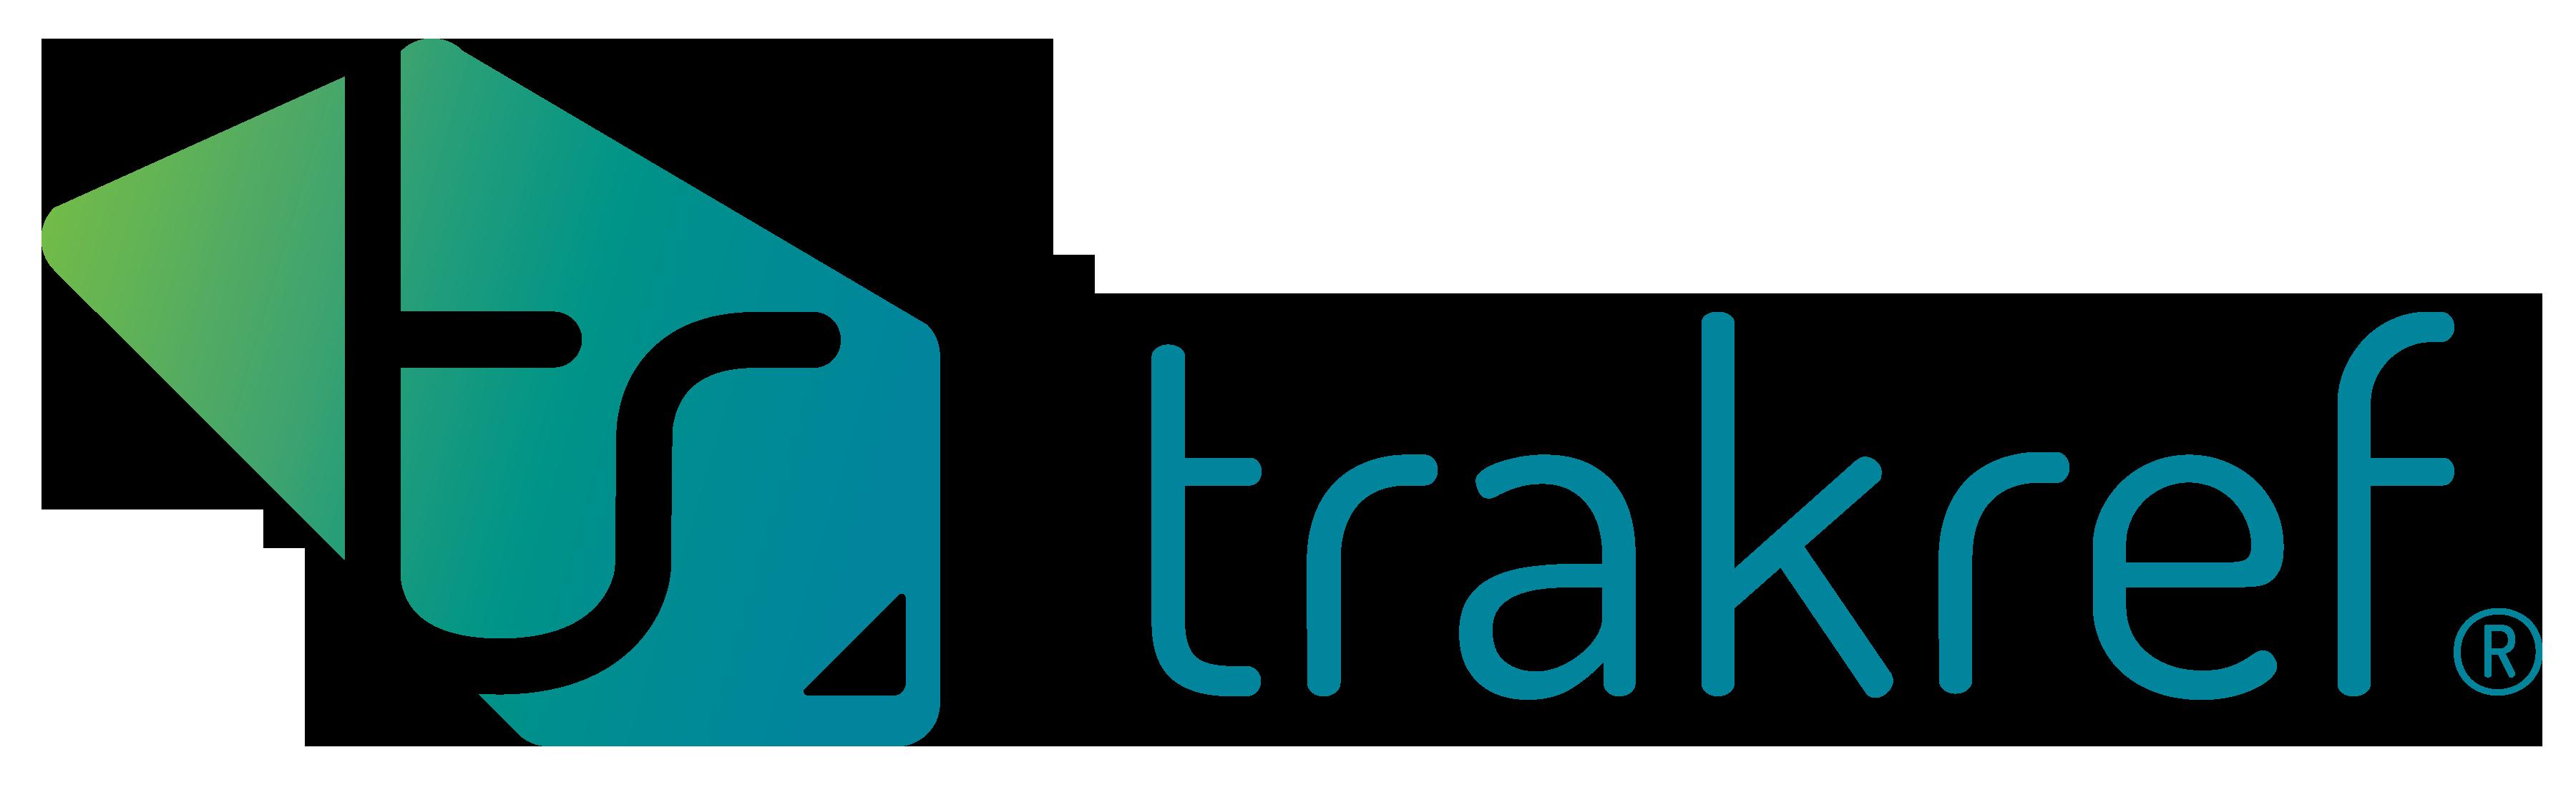 trakref-logo-rgb-XL-1.png